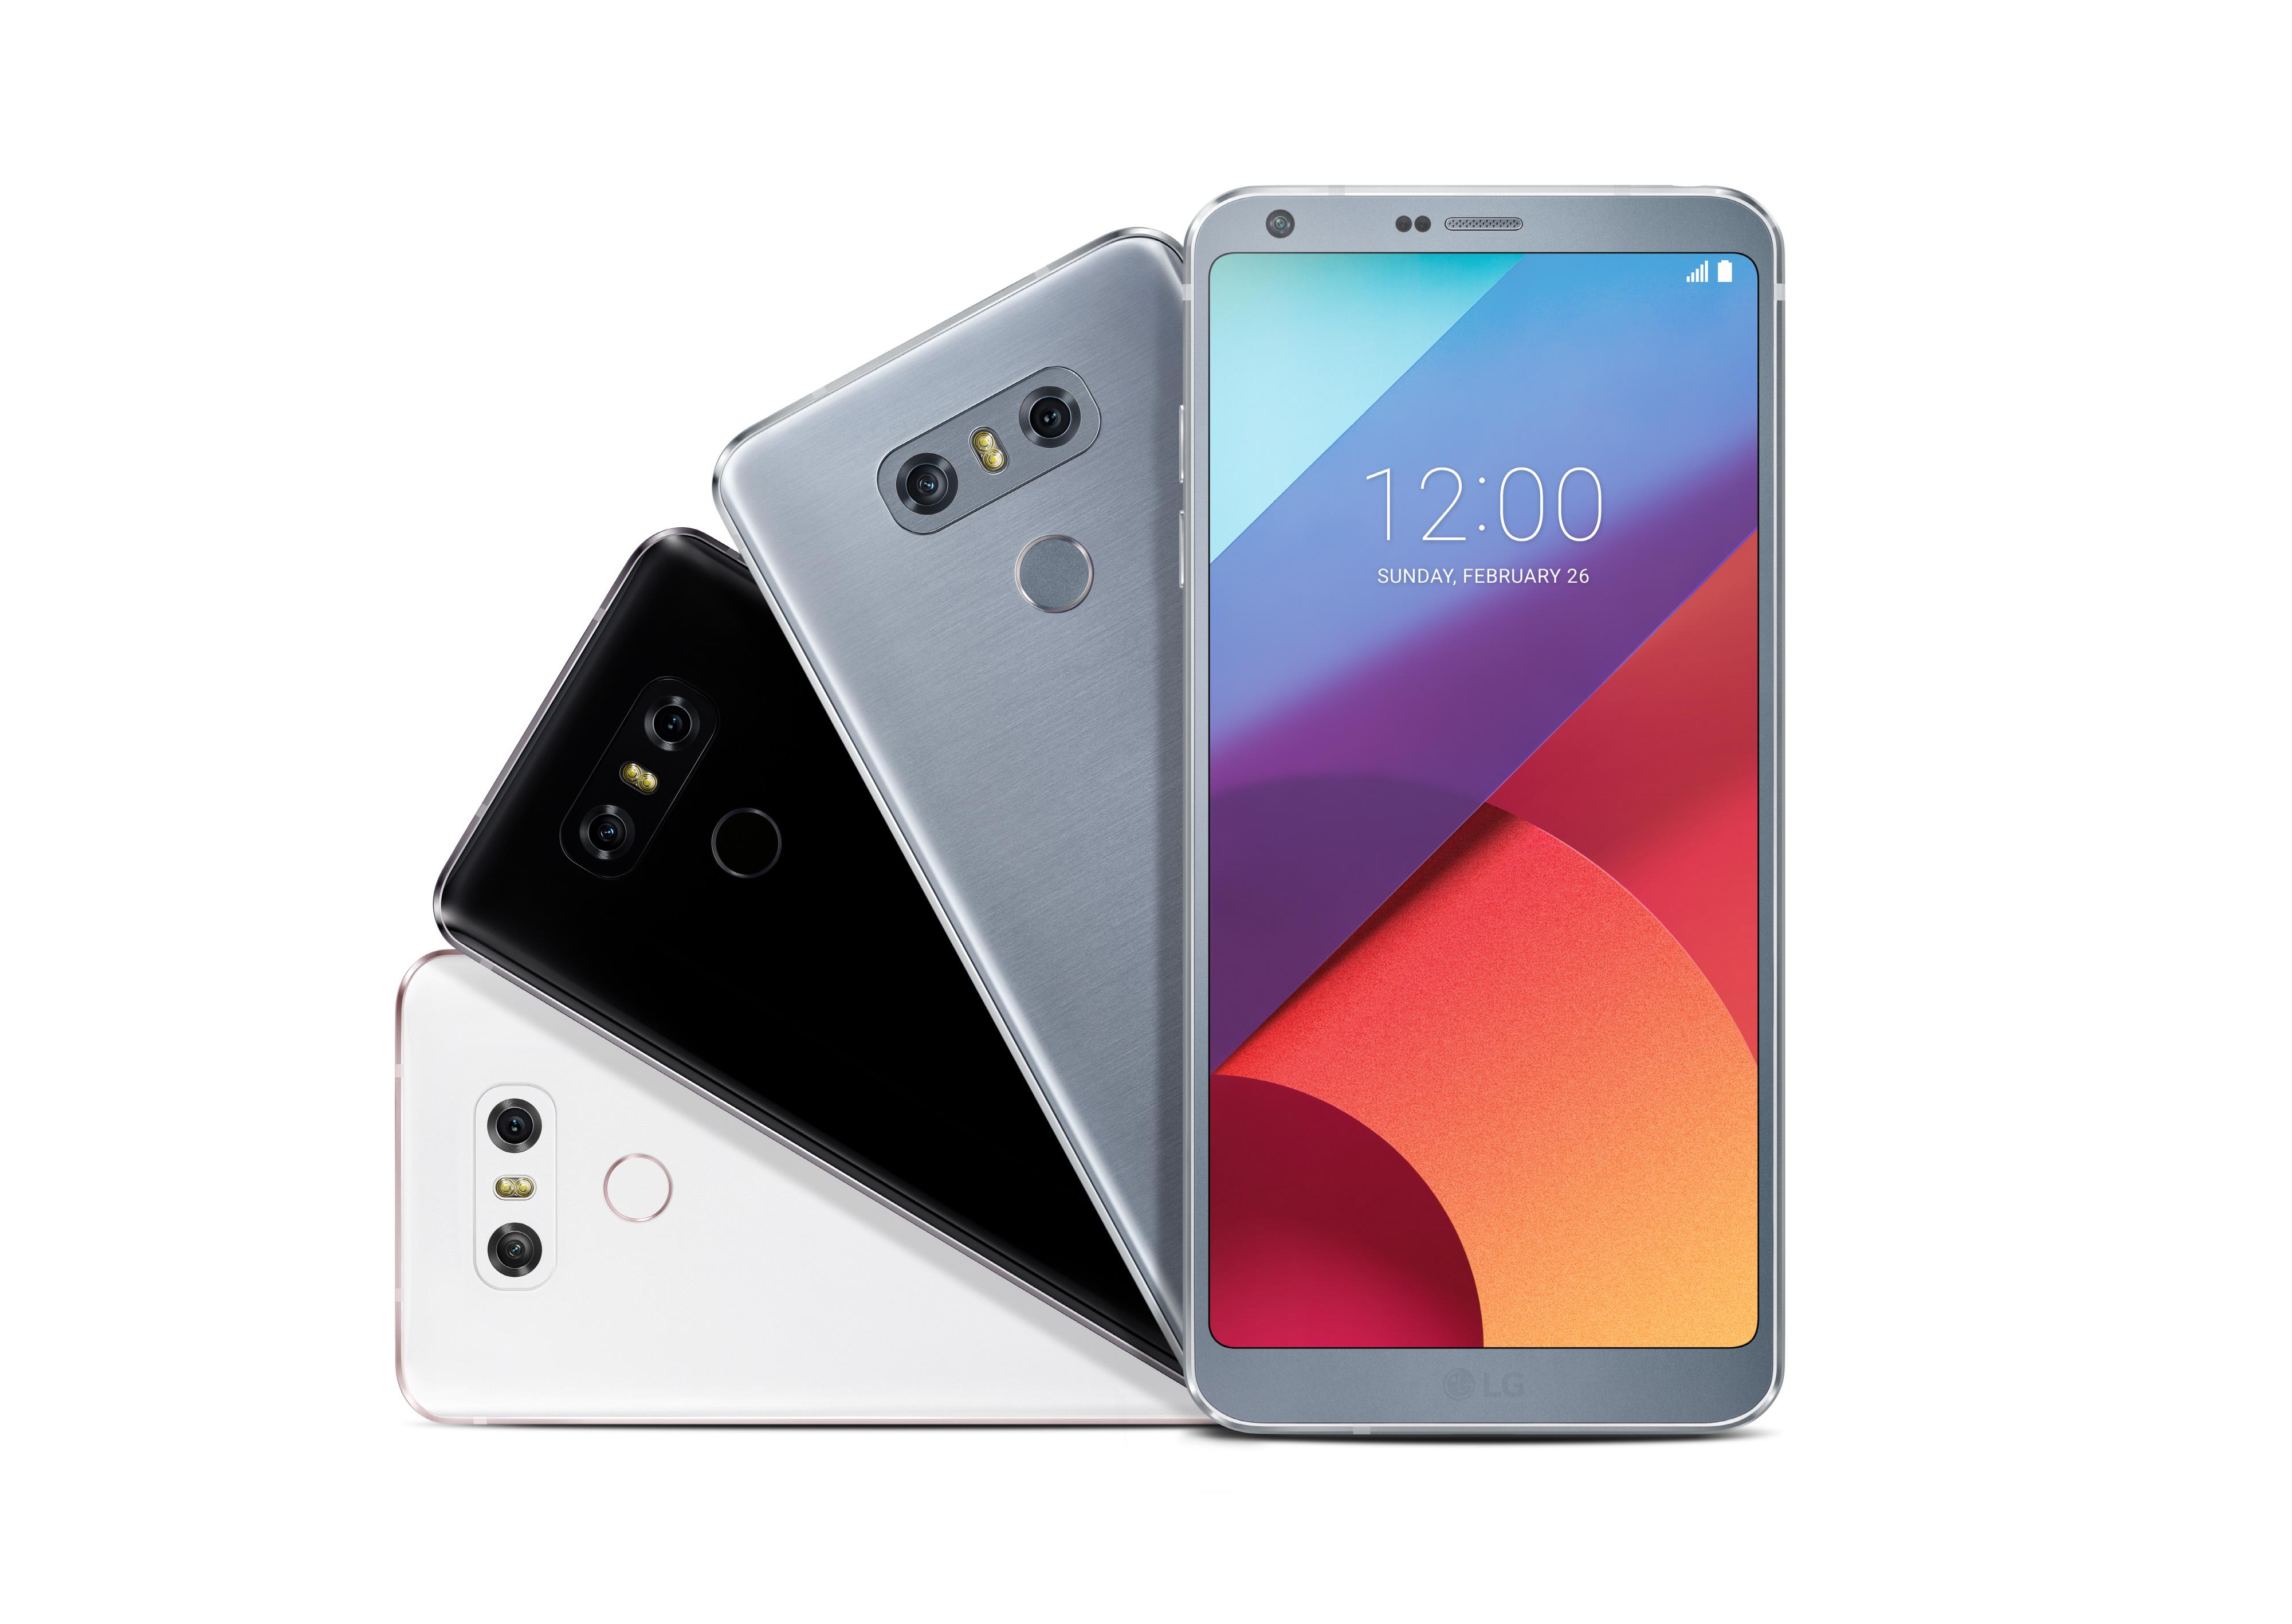 LG G6 01_all.jpg